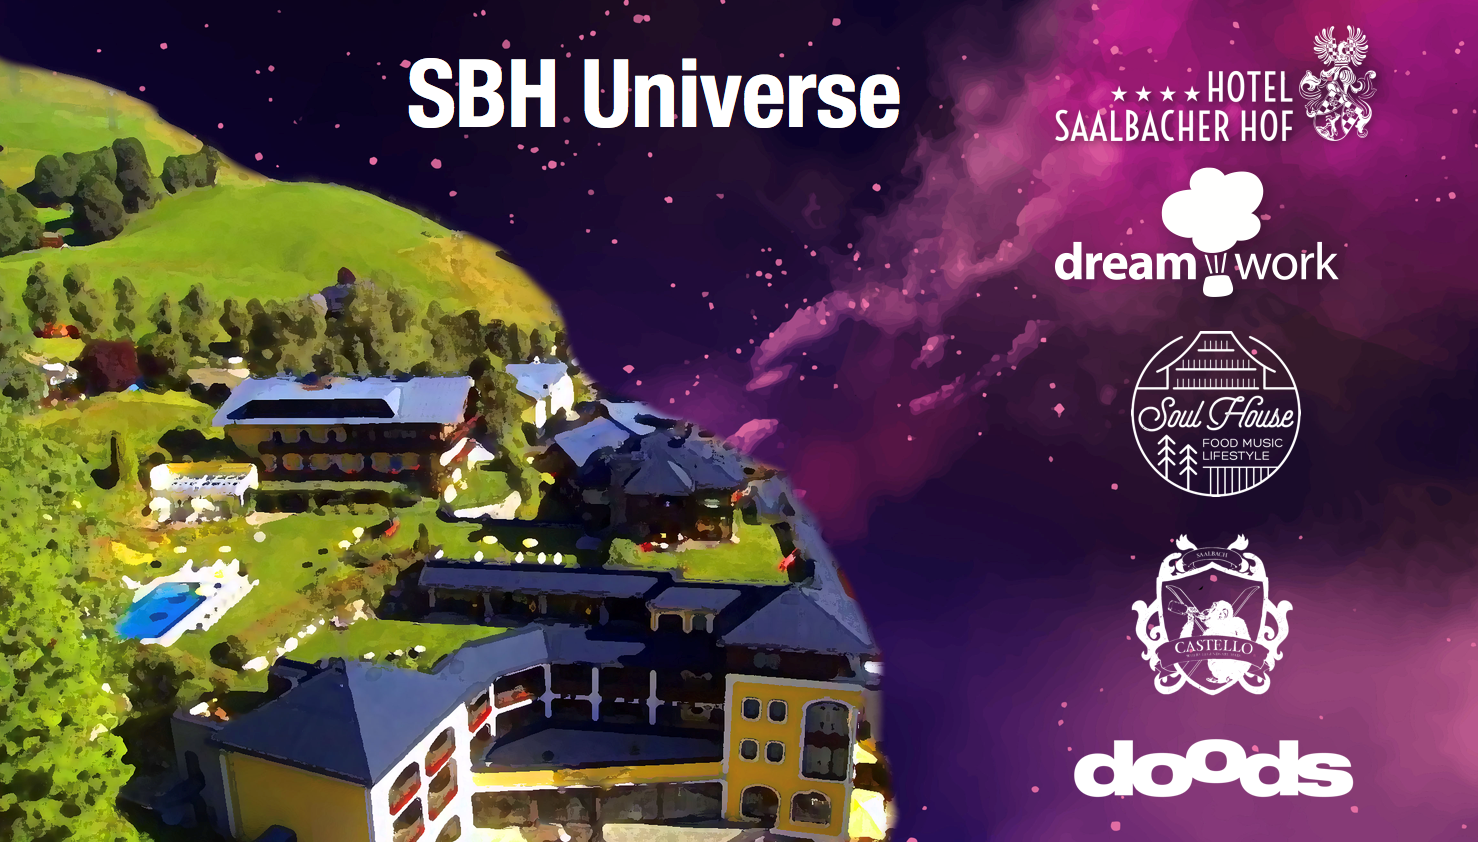 SBH Univers-zugeschnitten